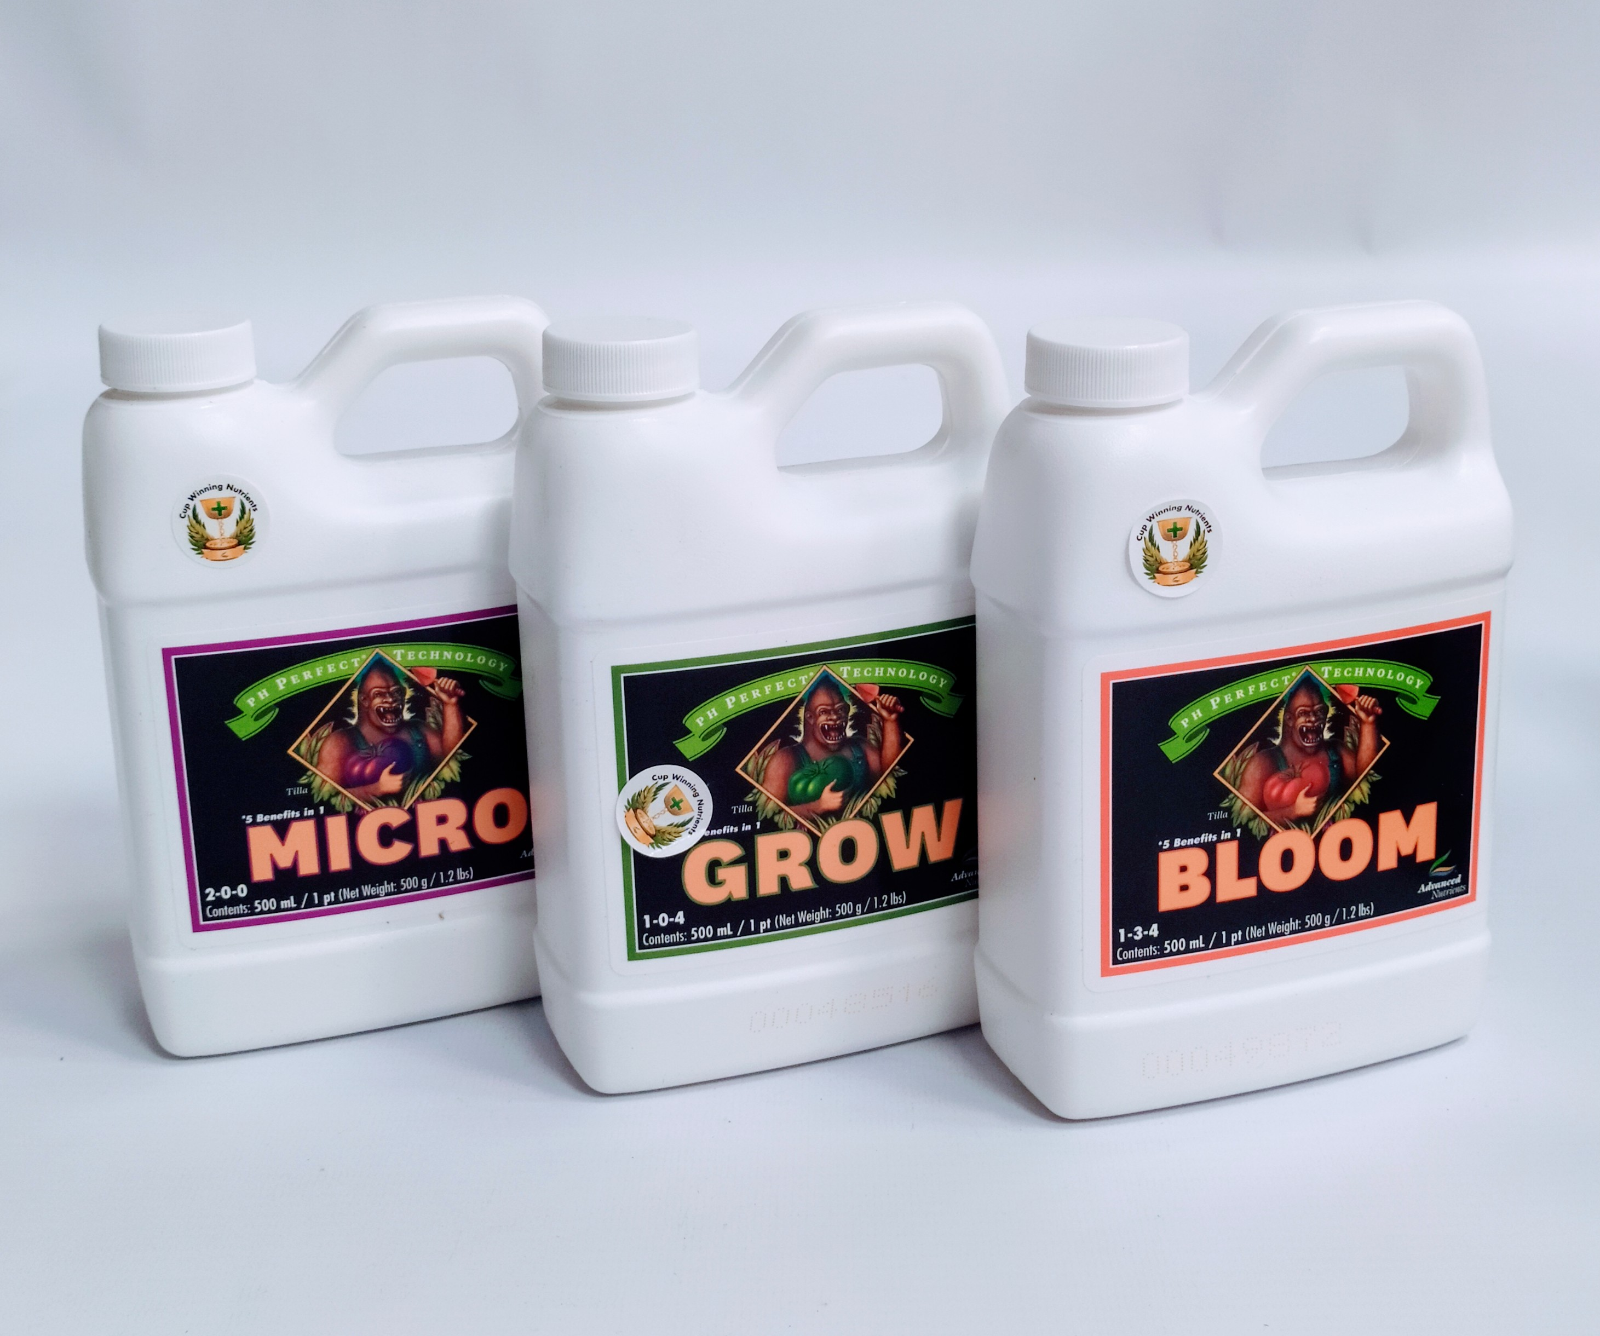 ADVANCED MICRO/GROW/BLOOM 500ml